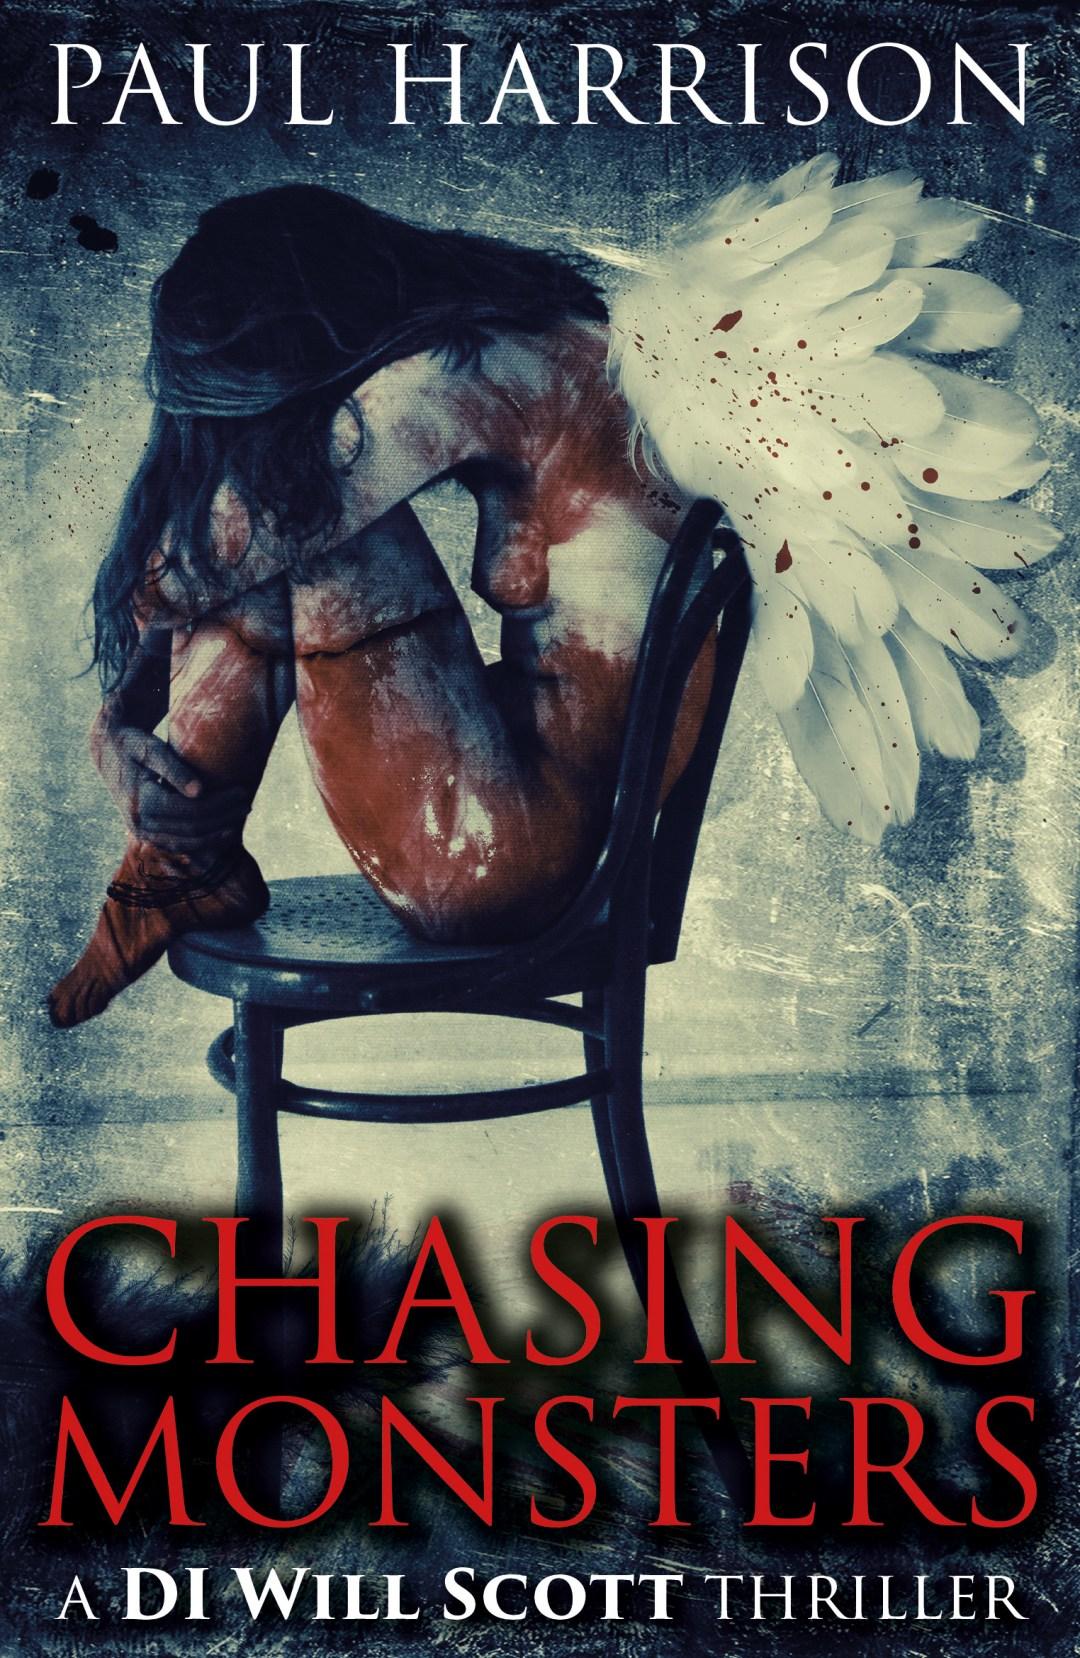 #Excerpt of Chasing Monsters by Paul Harrison  @PHarrisonauthor   @UrbaneBooks #LoveBooksGroup